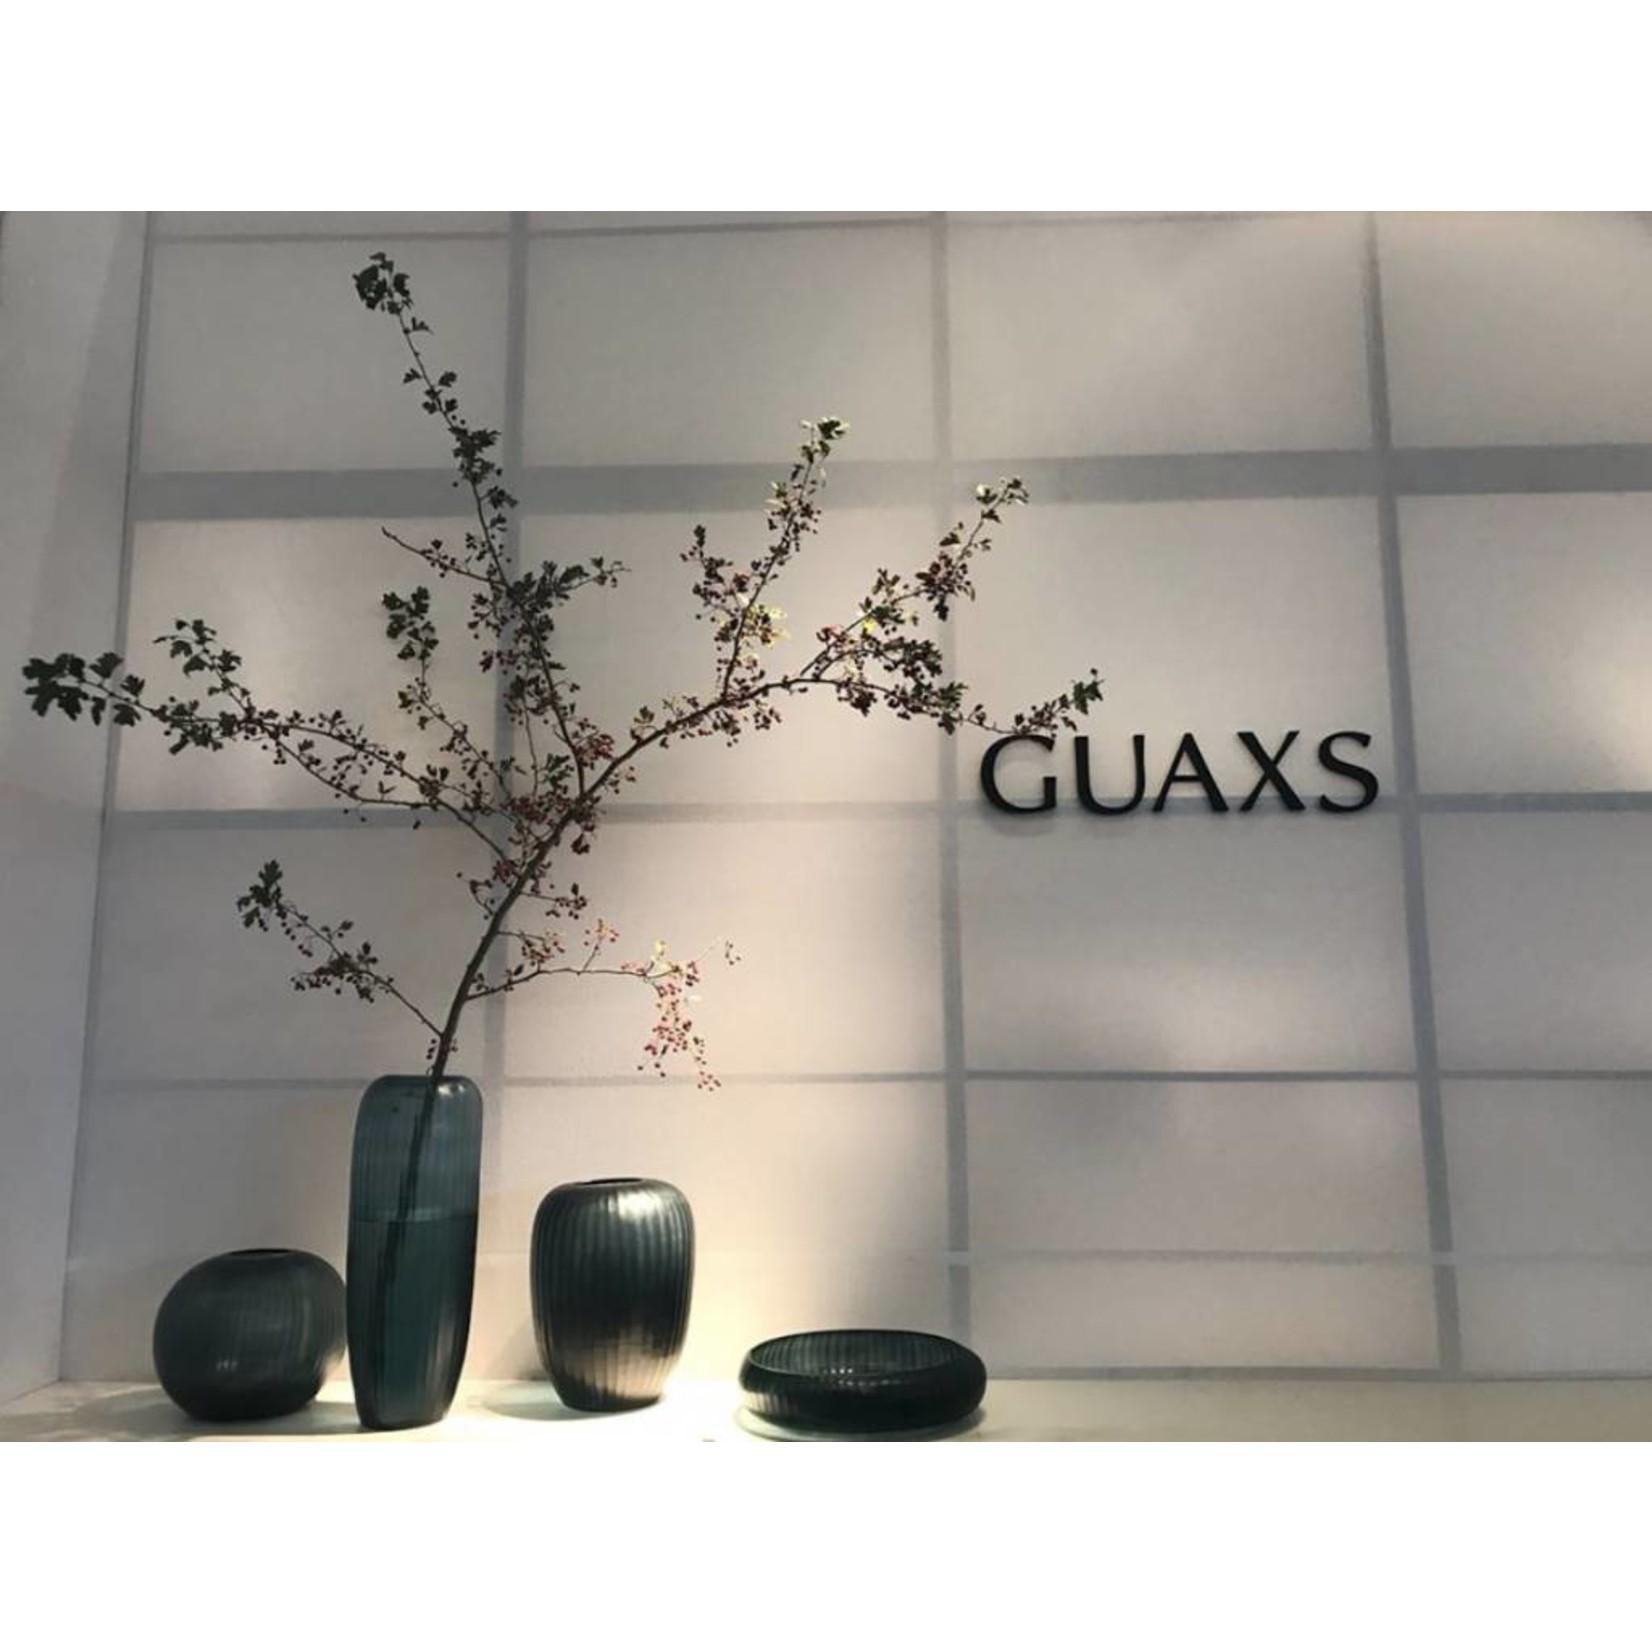 Guaxs Vaas Gobi Round | Ocean Blue / Indigo